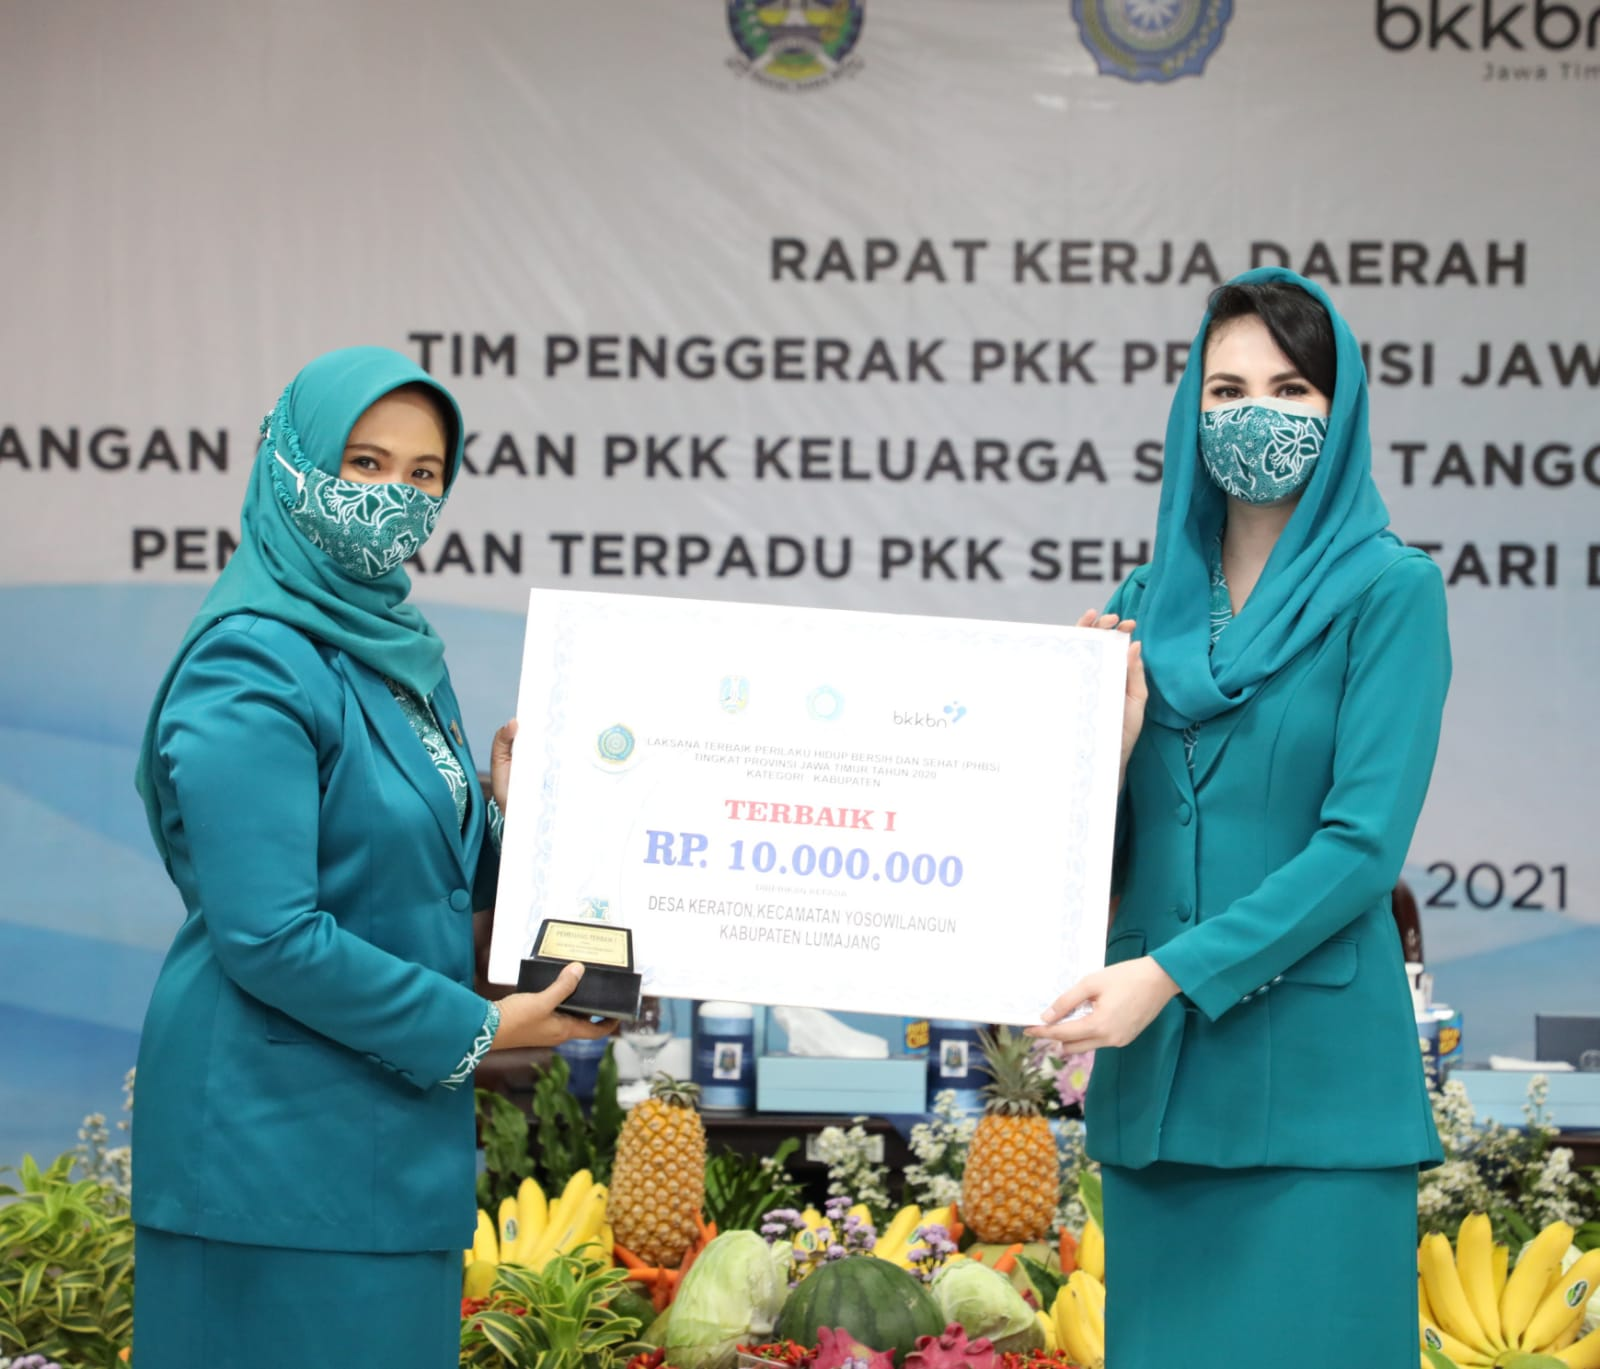 PKK Kab. Lumajang PHBS Terbaik Prov. Jawa Timur